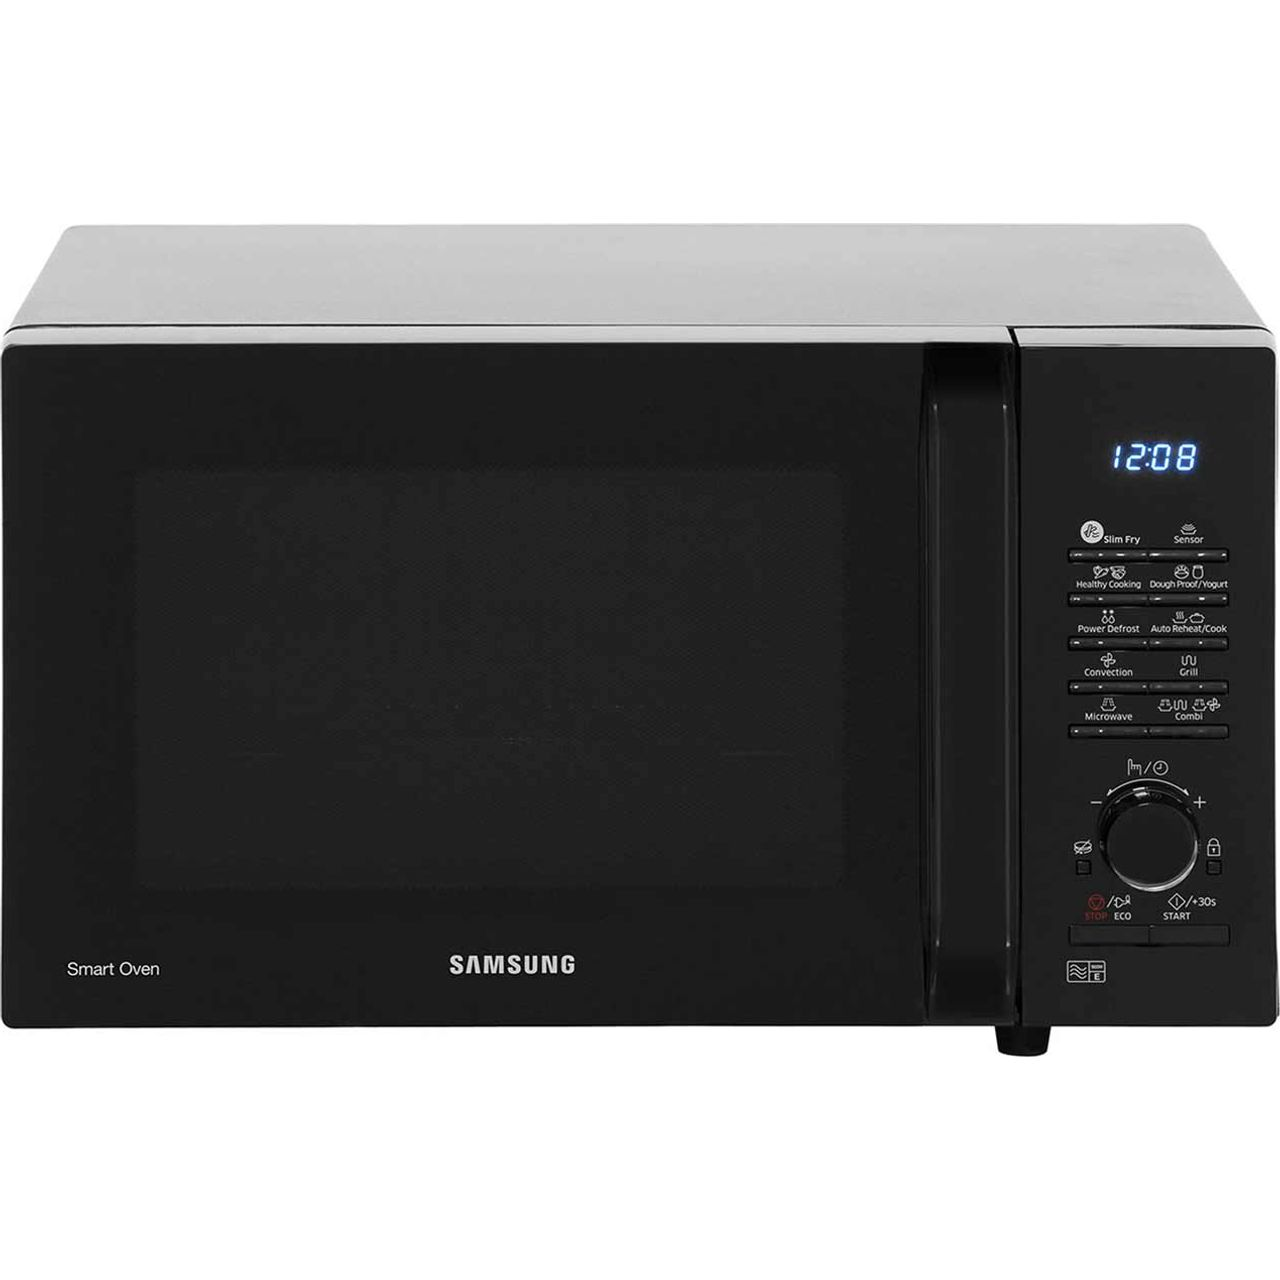 Samsung Mc28h5135ck Smart Oven 900 Watt Microwave Free